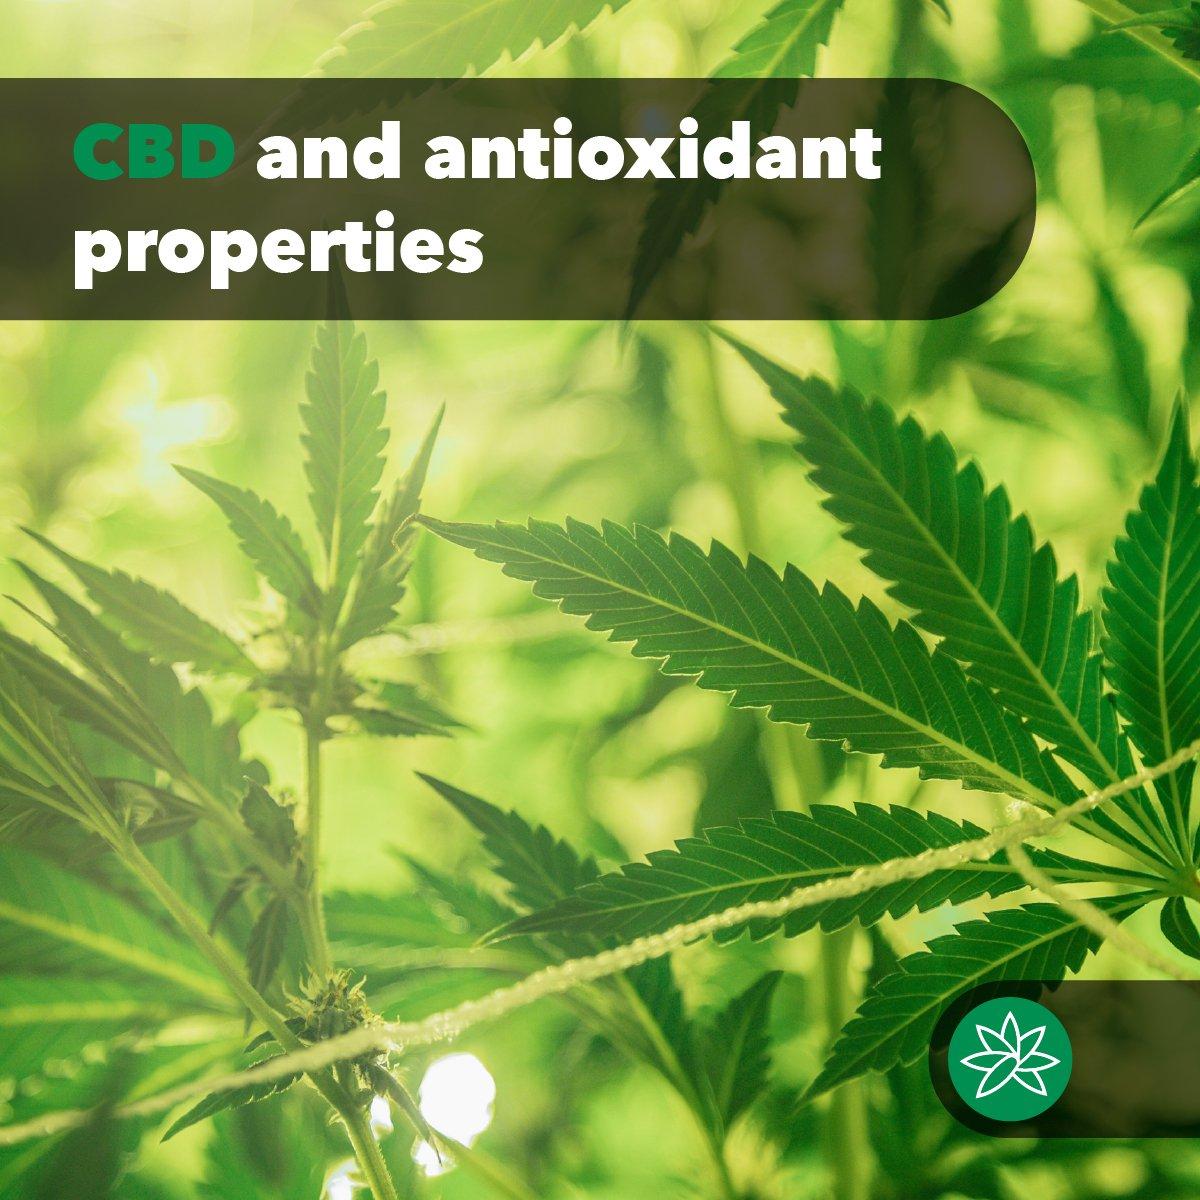 CBD and antioxidant properties